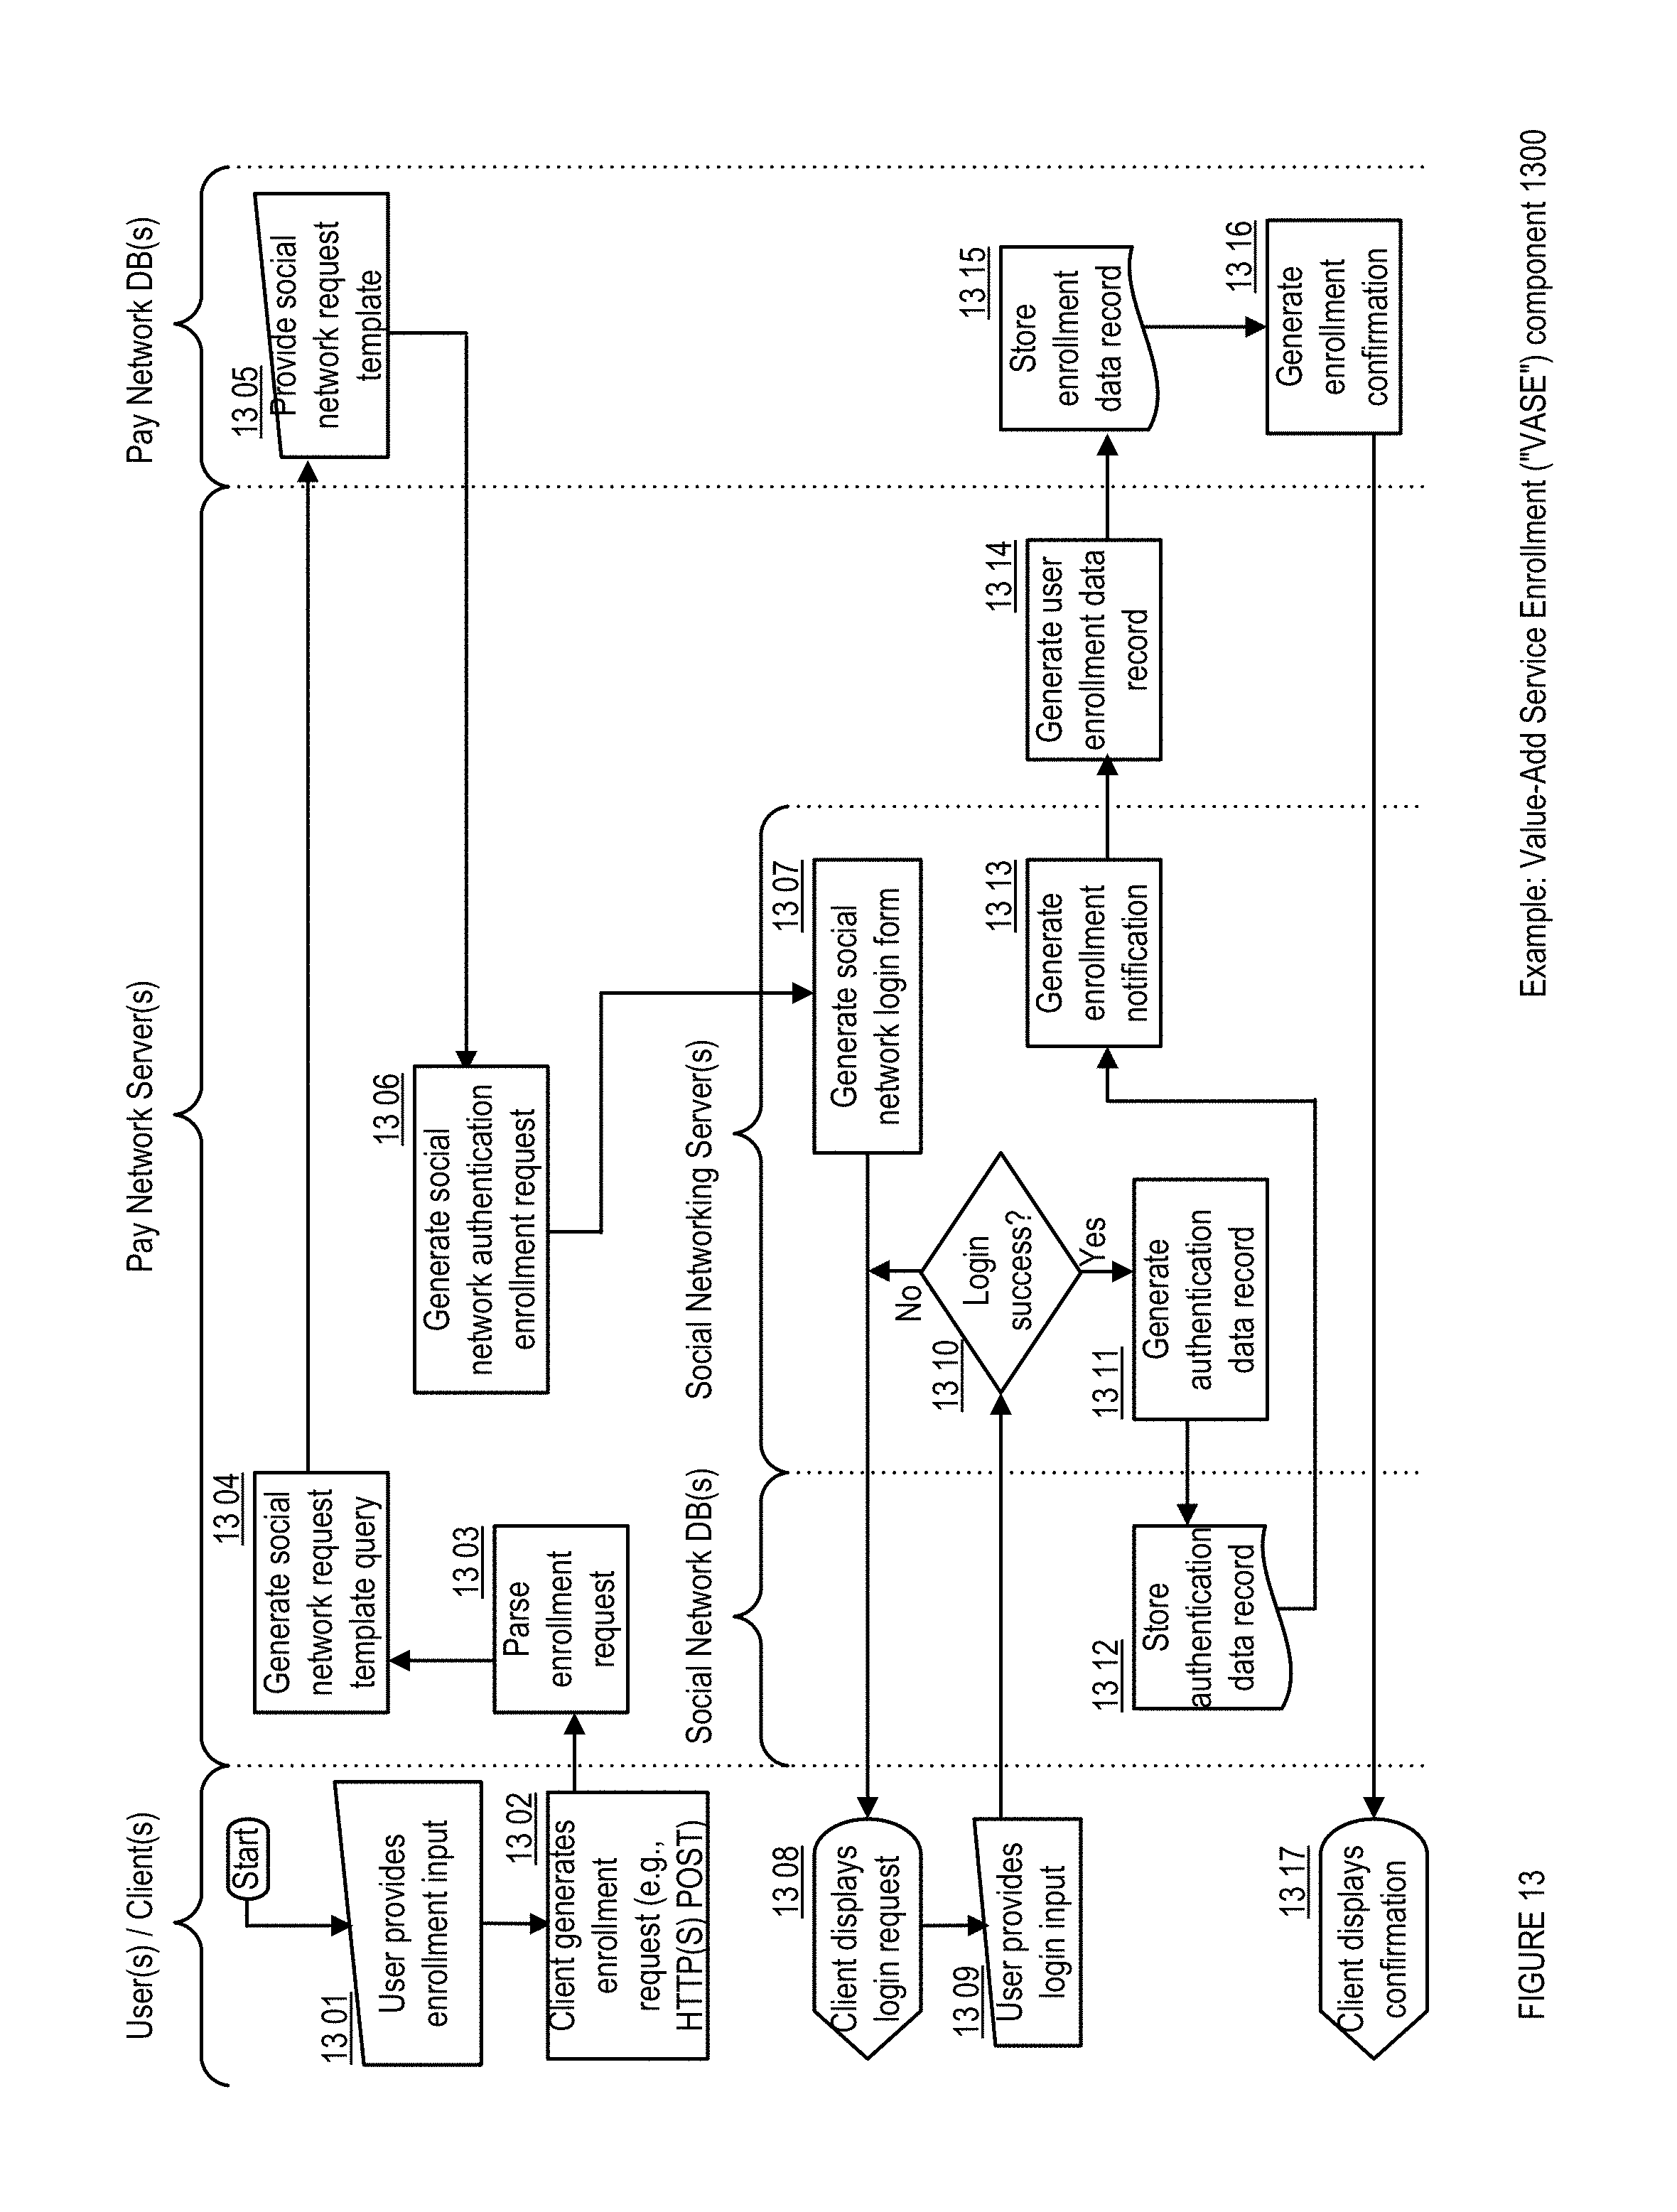 Patent Us 9830328 B2 1991 Explorer Wiring Diagram Auto Zone Images